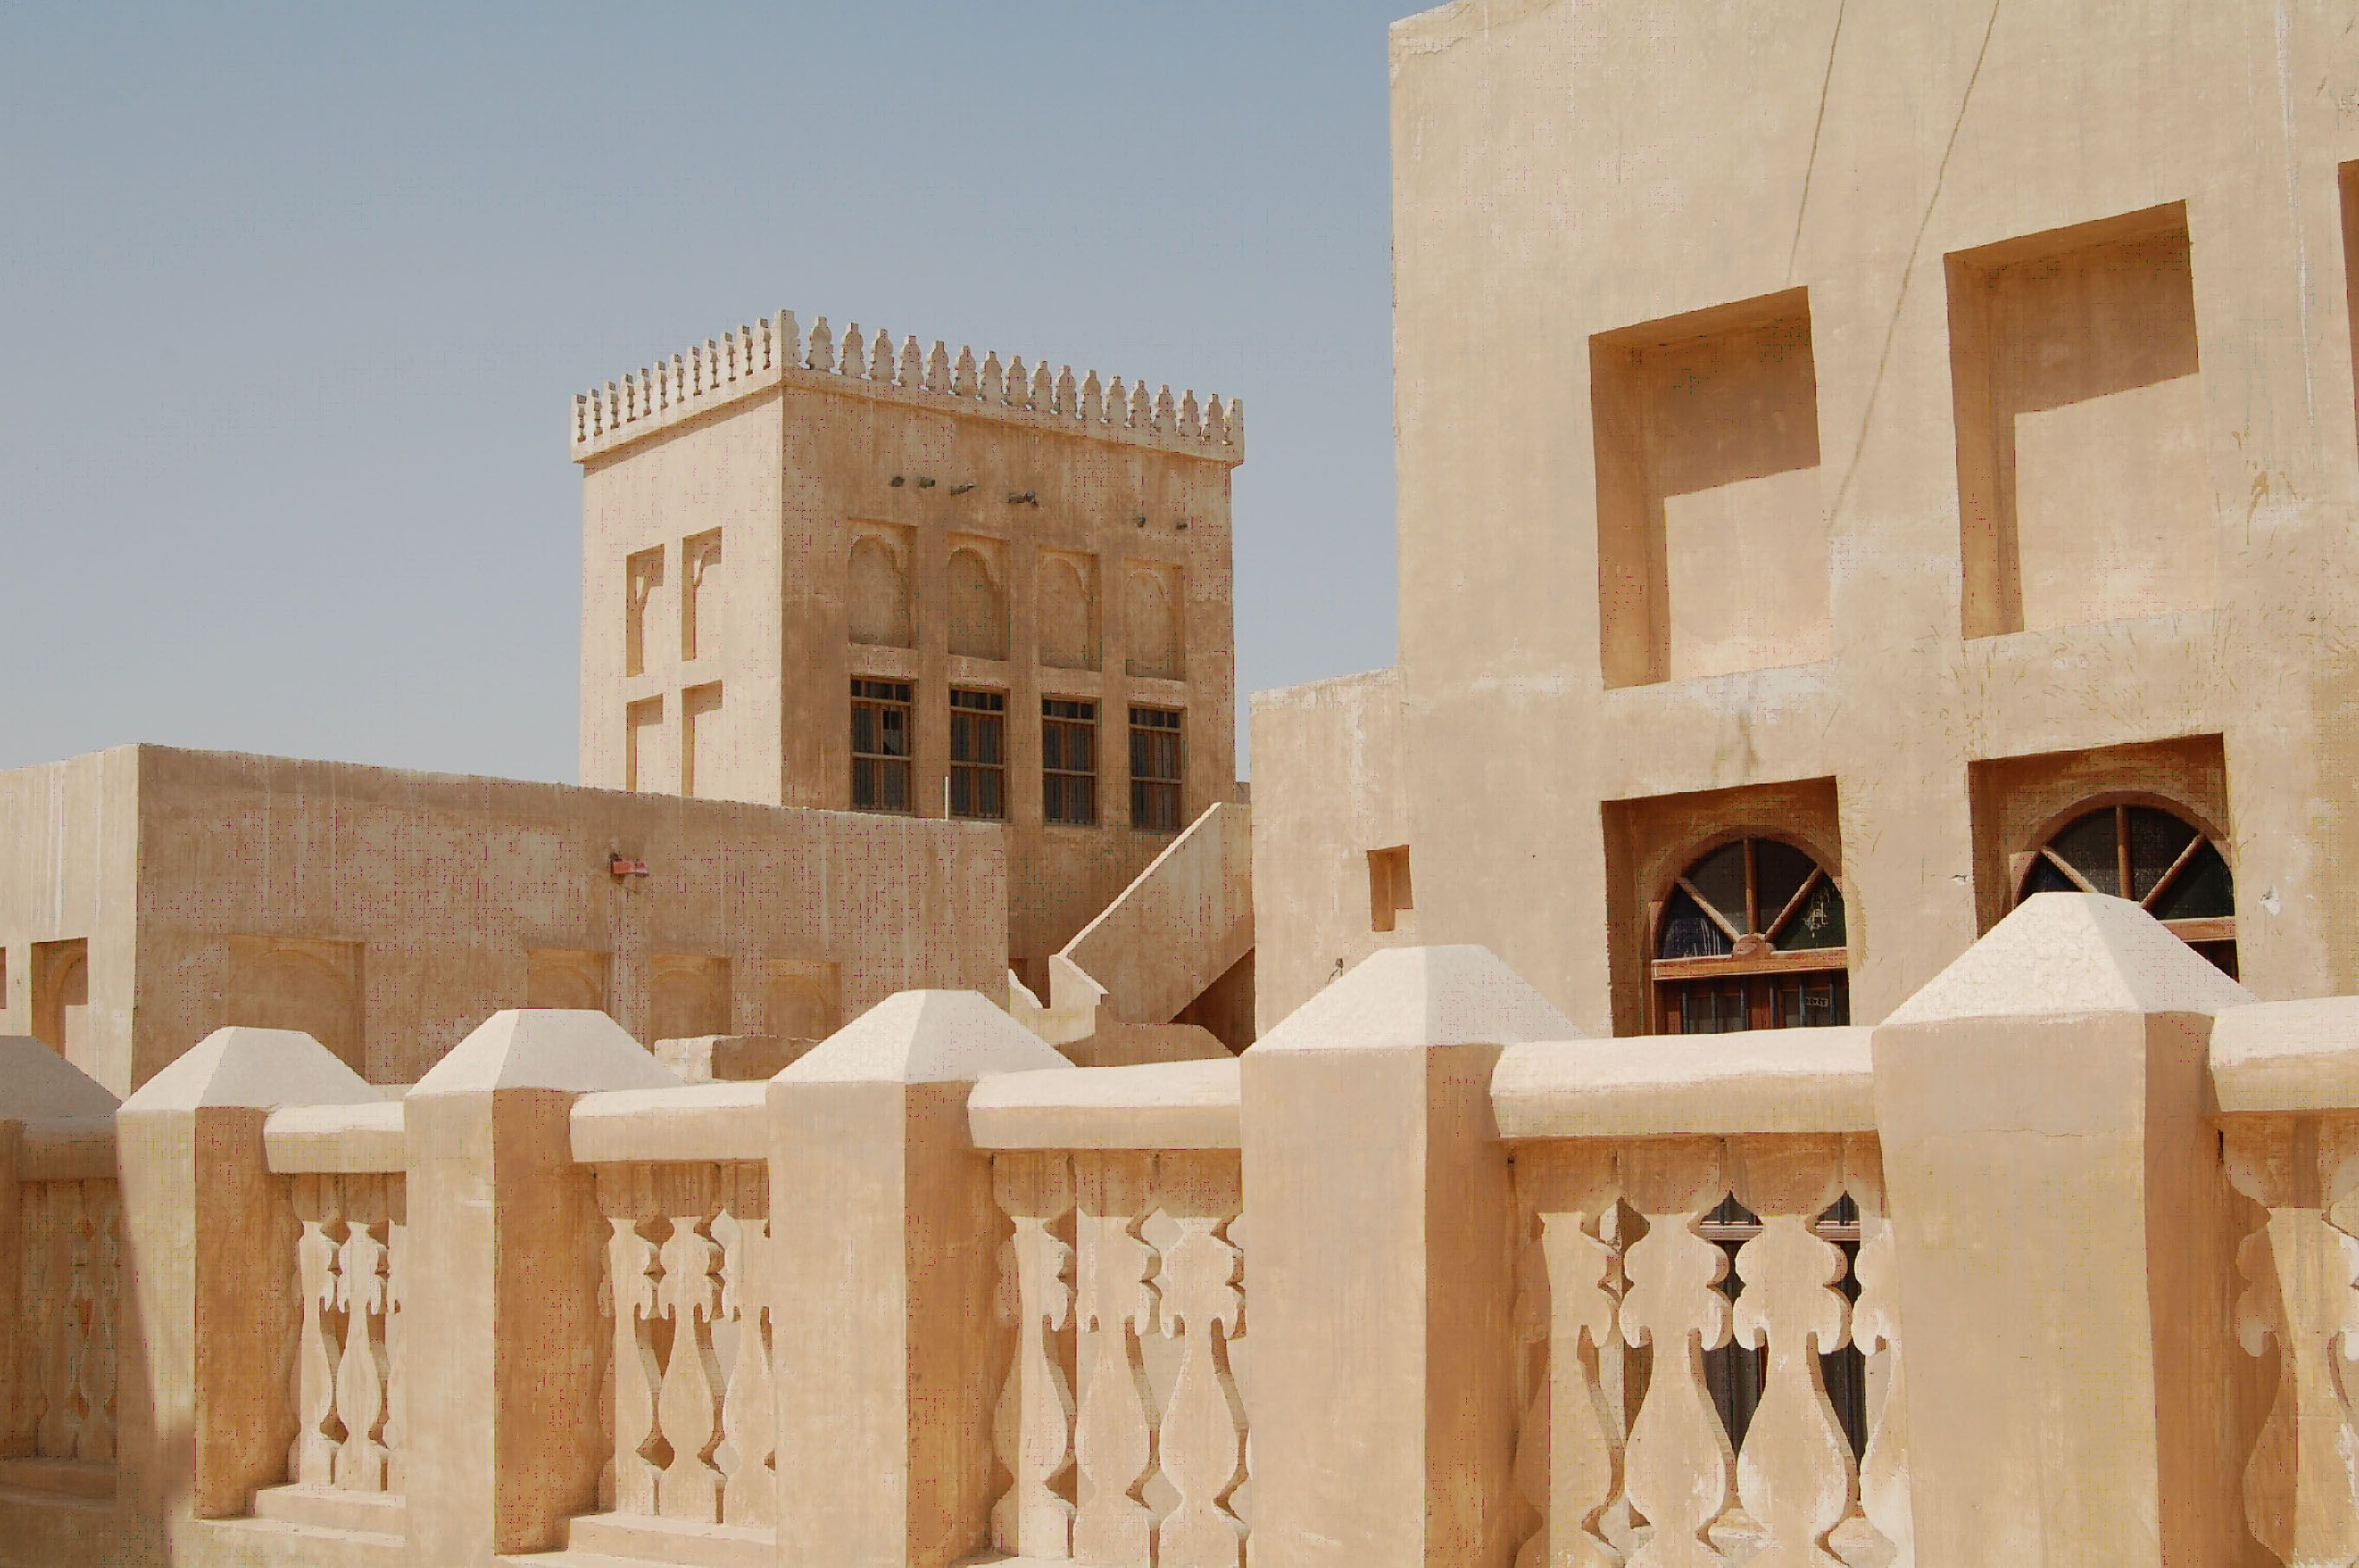 Image gallery qatari architecture for Architecture companies qatar